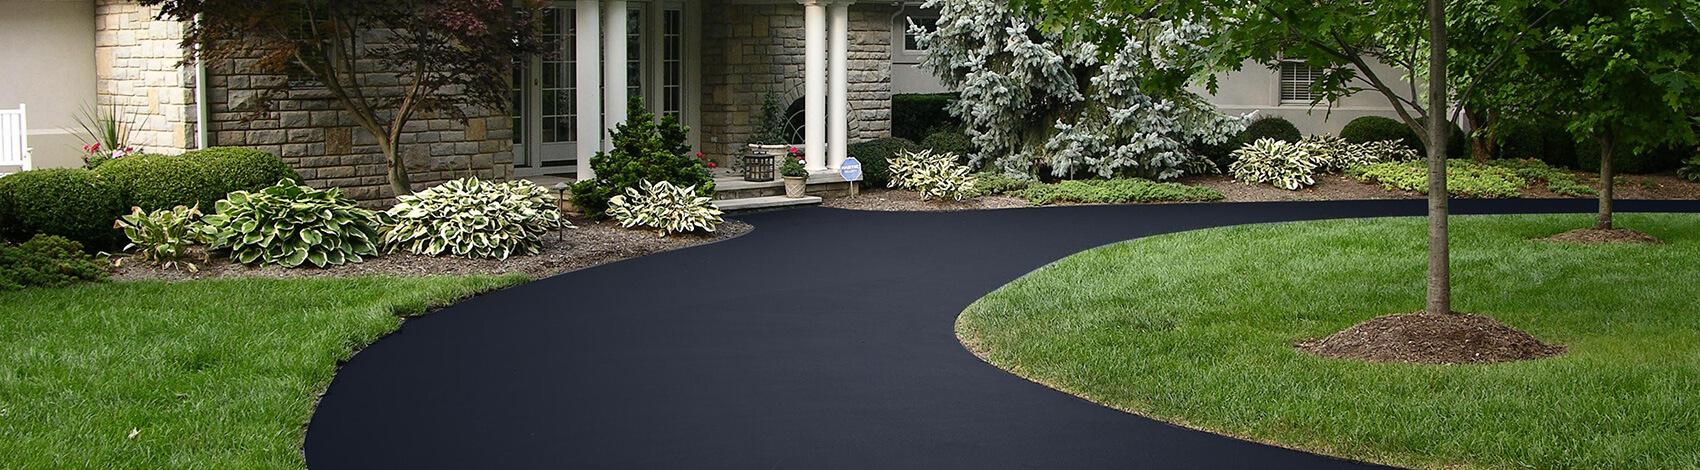 Asphalt driveway sealer, blacktop coating, asphalt sealer, driveway coating